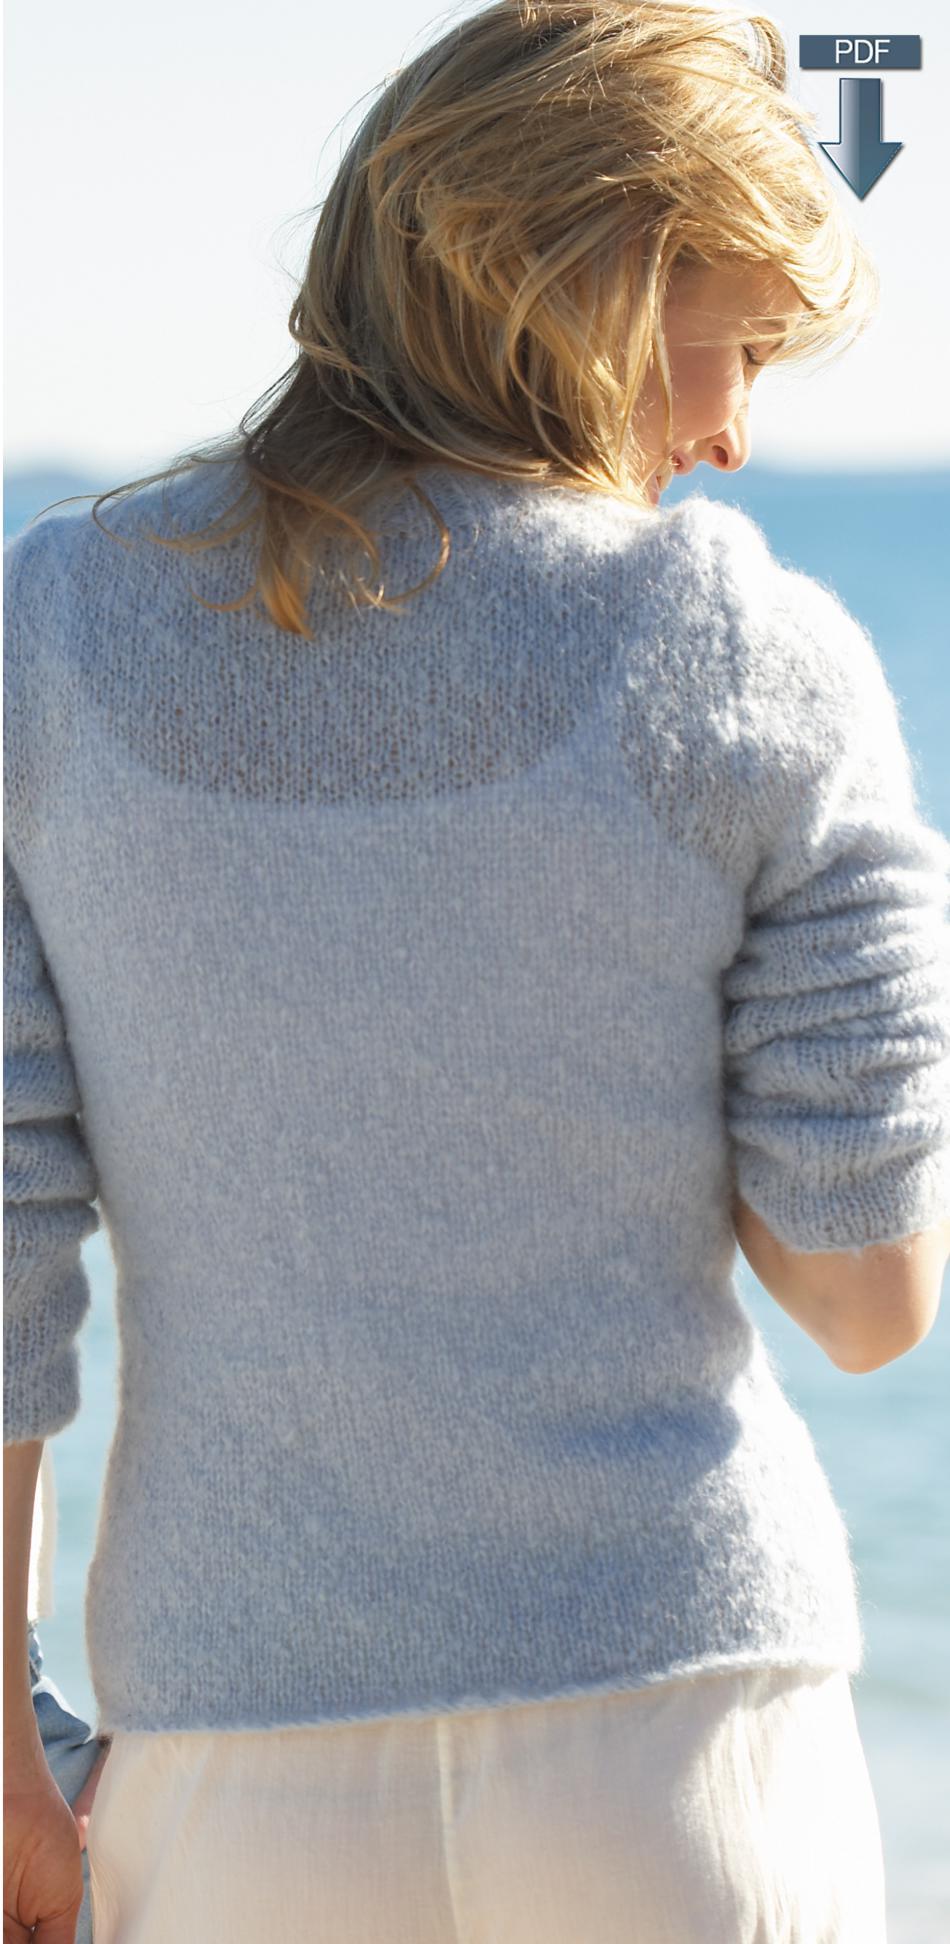 056774d88 ... Jo Sharp Mohair Sweater - Pattern Download (image B)